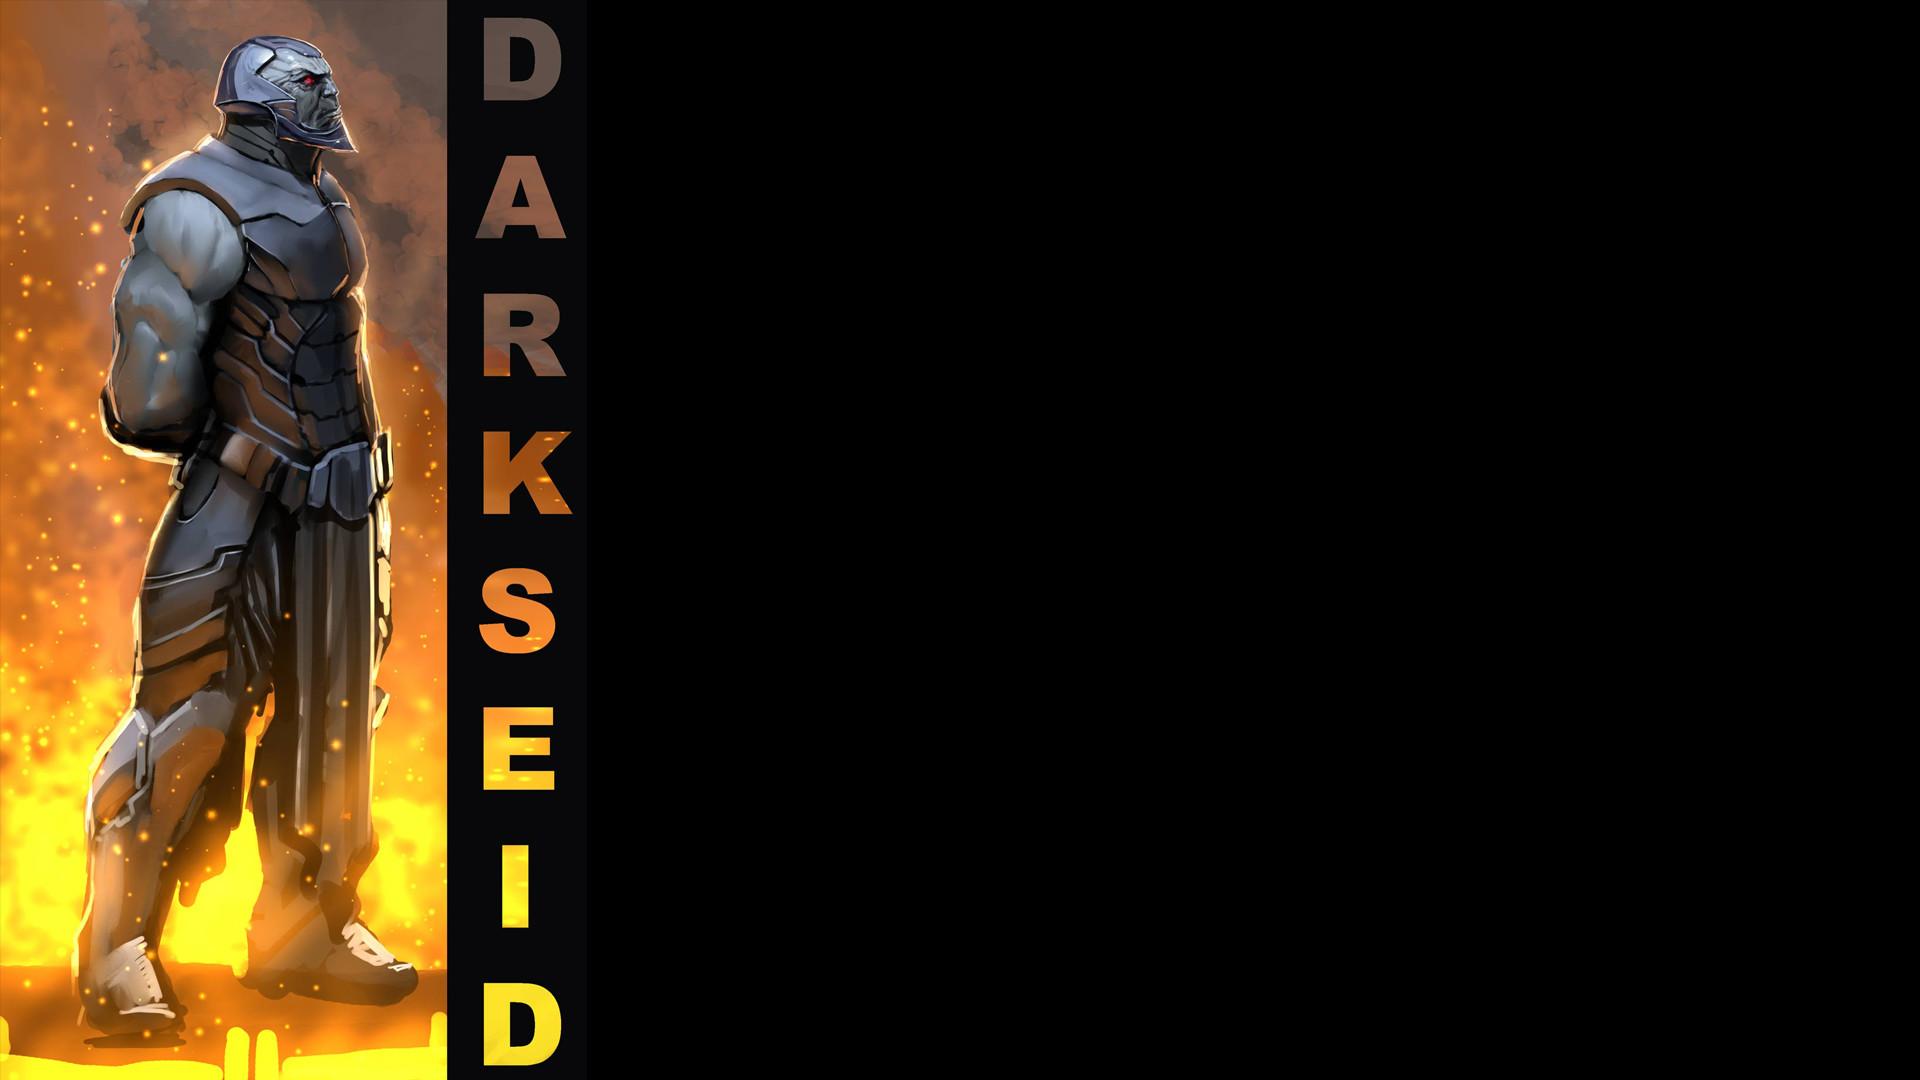 Recommended: Darkseid Wallpapers February 11, 2015, Carmen Motyka